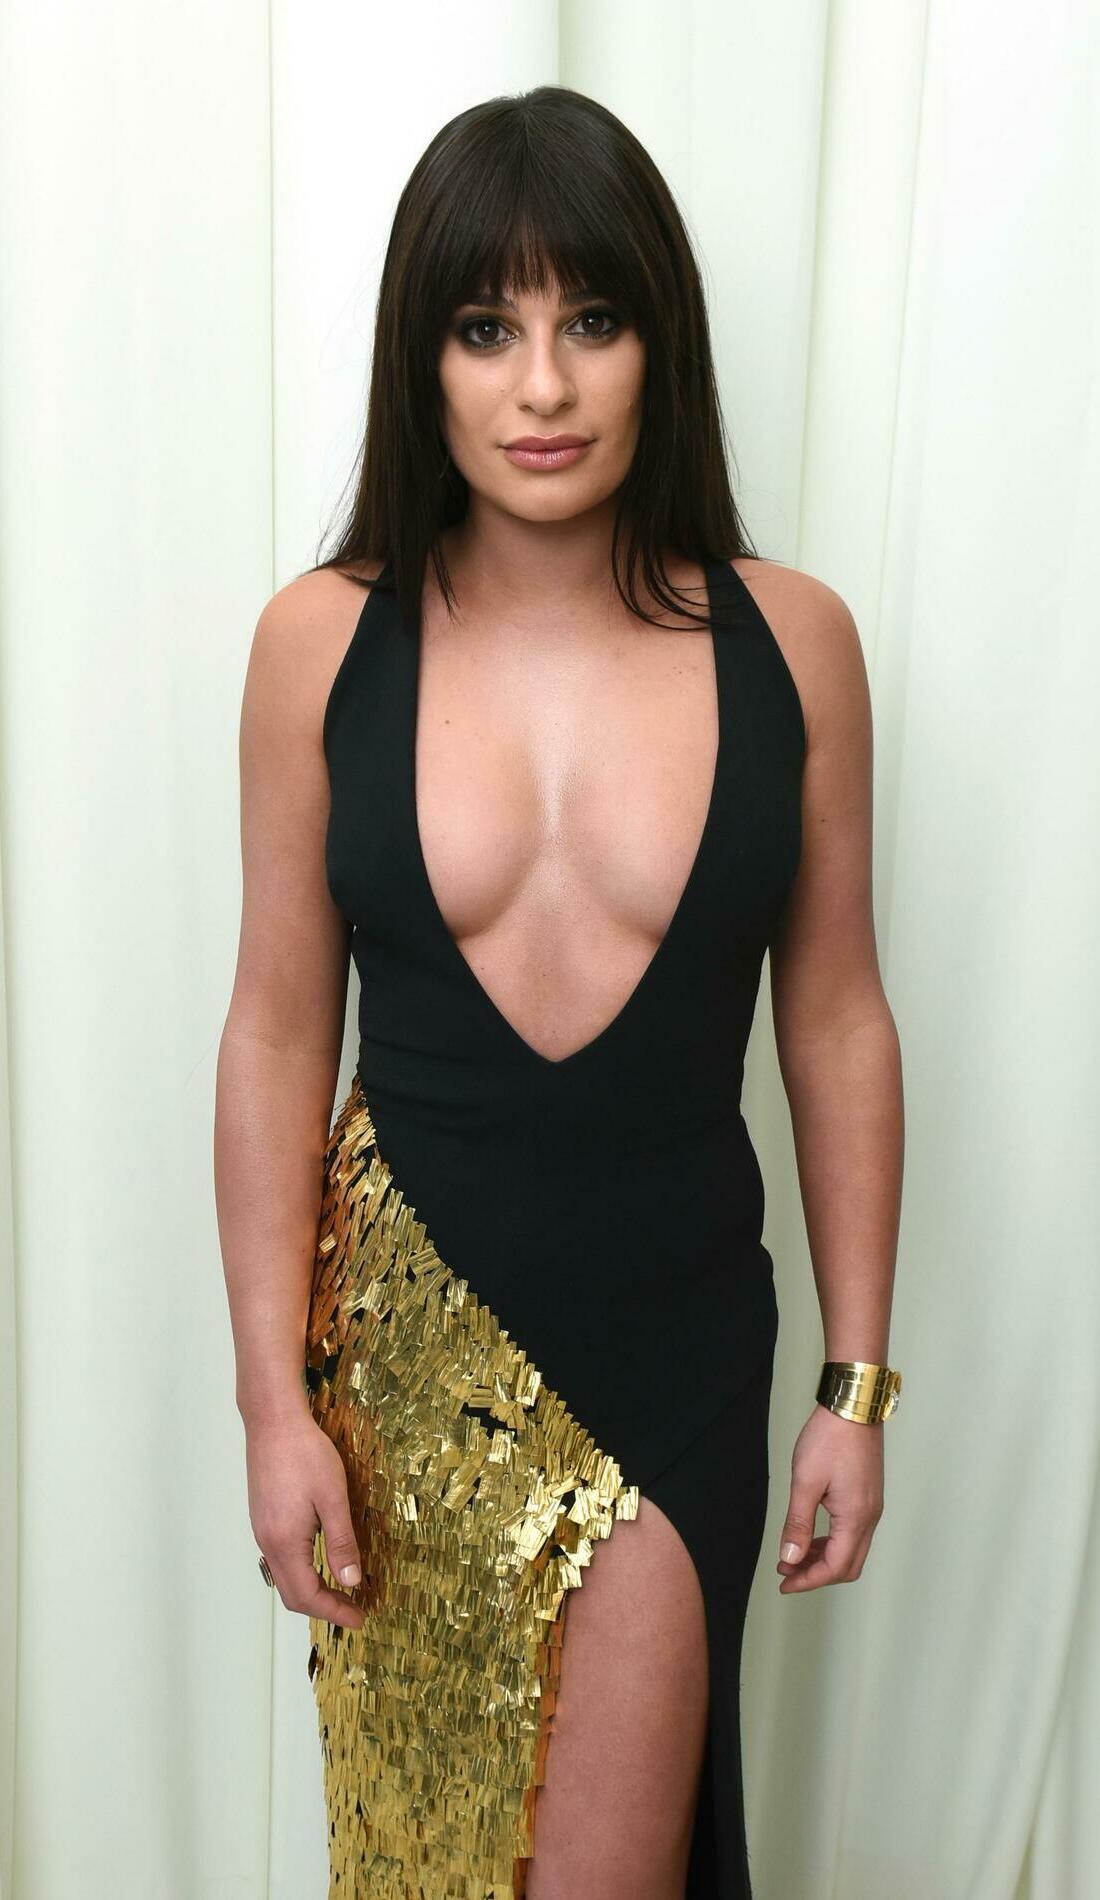 A Lea Michele live event